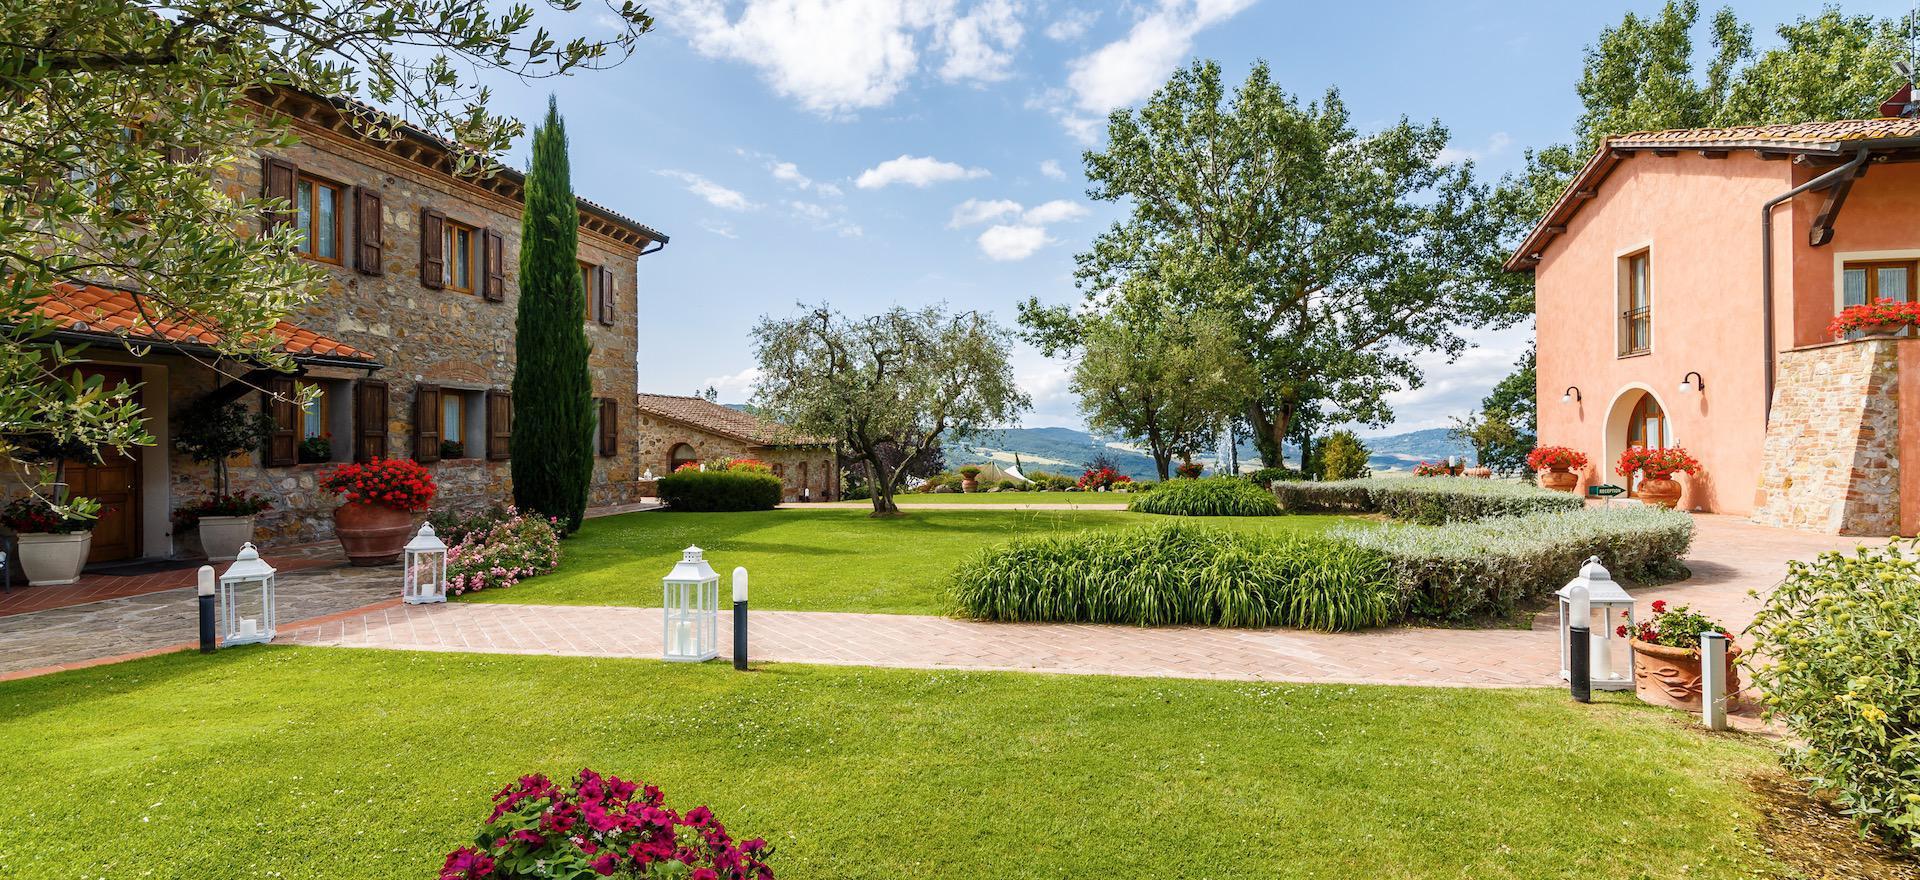 Agriturismo Toscane Agriturismo in Toscane, centraal gelegen en mooi uitzicht